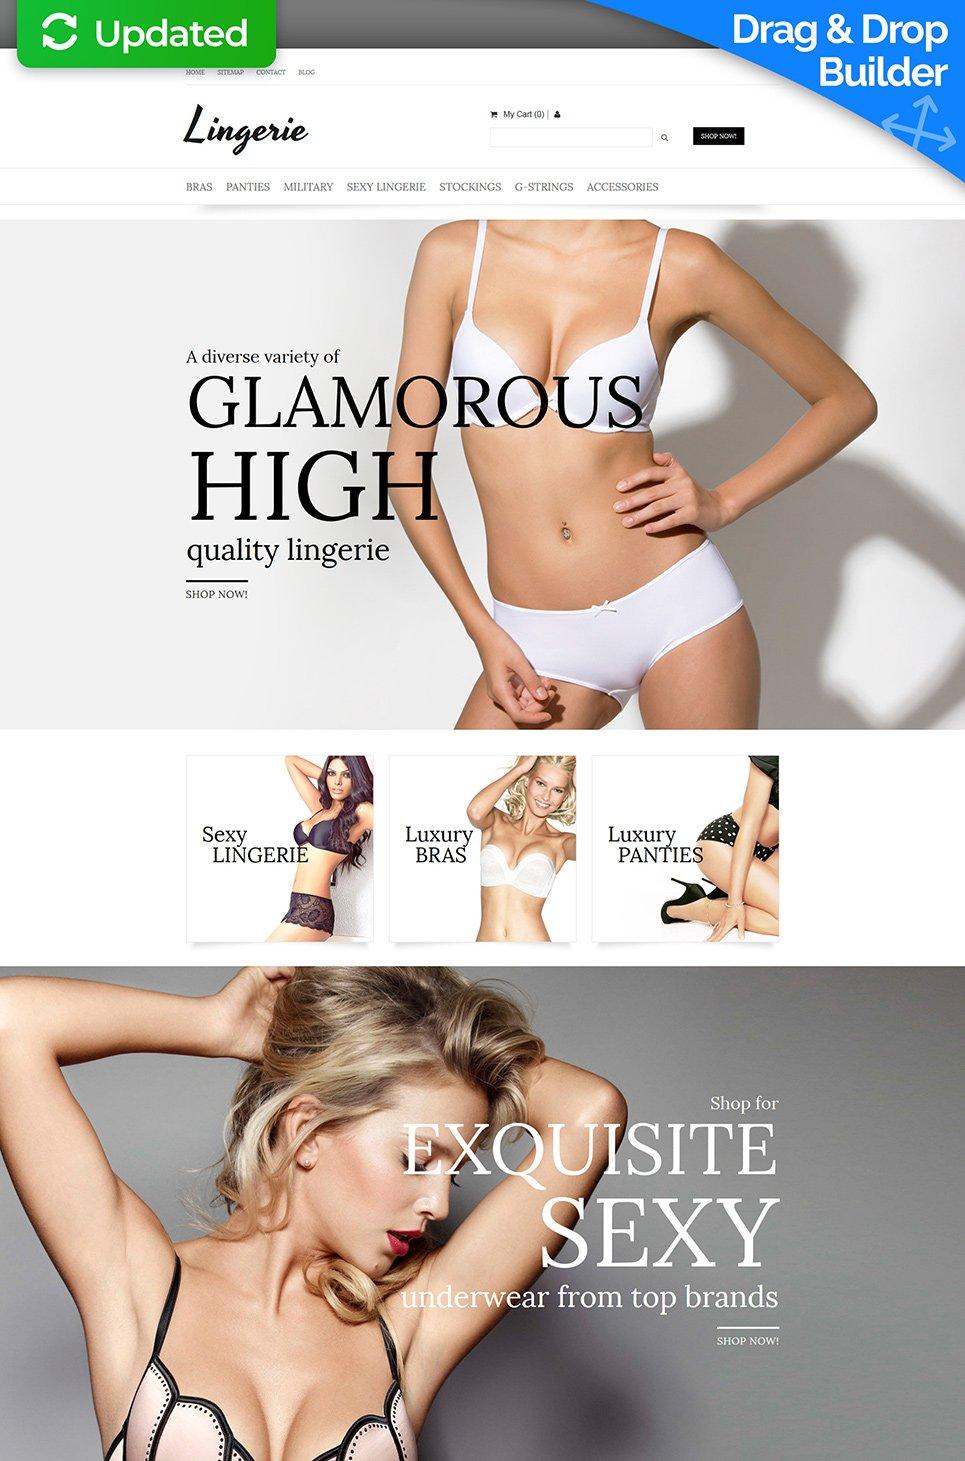 Lingerie Ecommerce Website Template - image